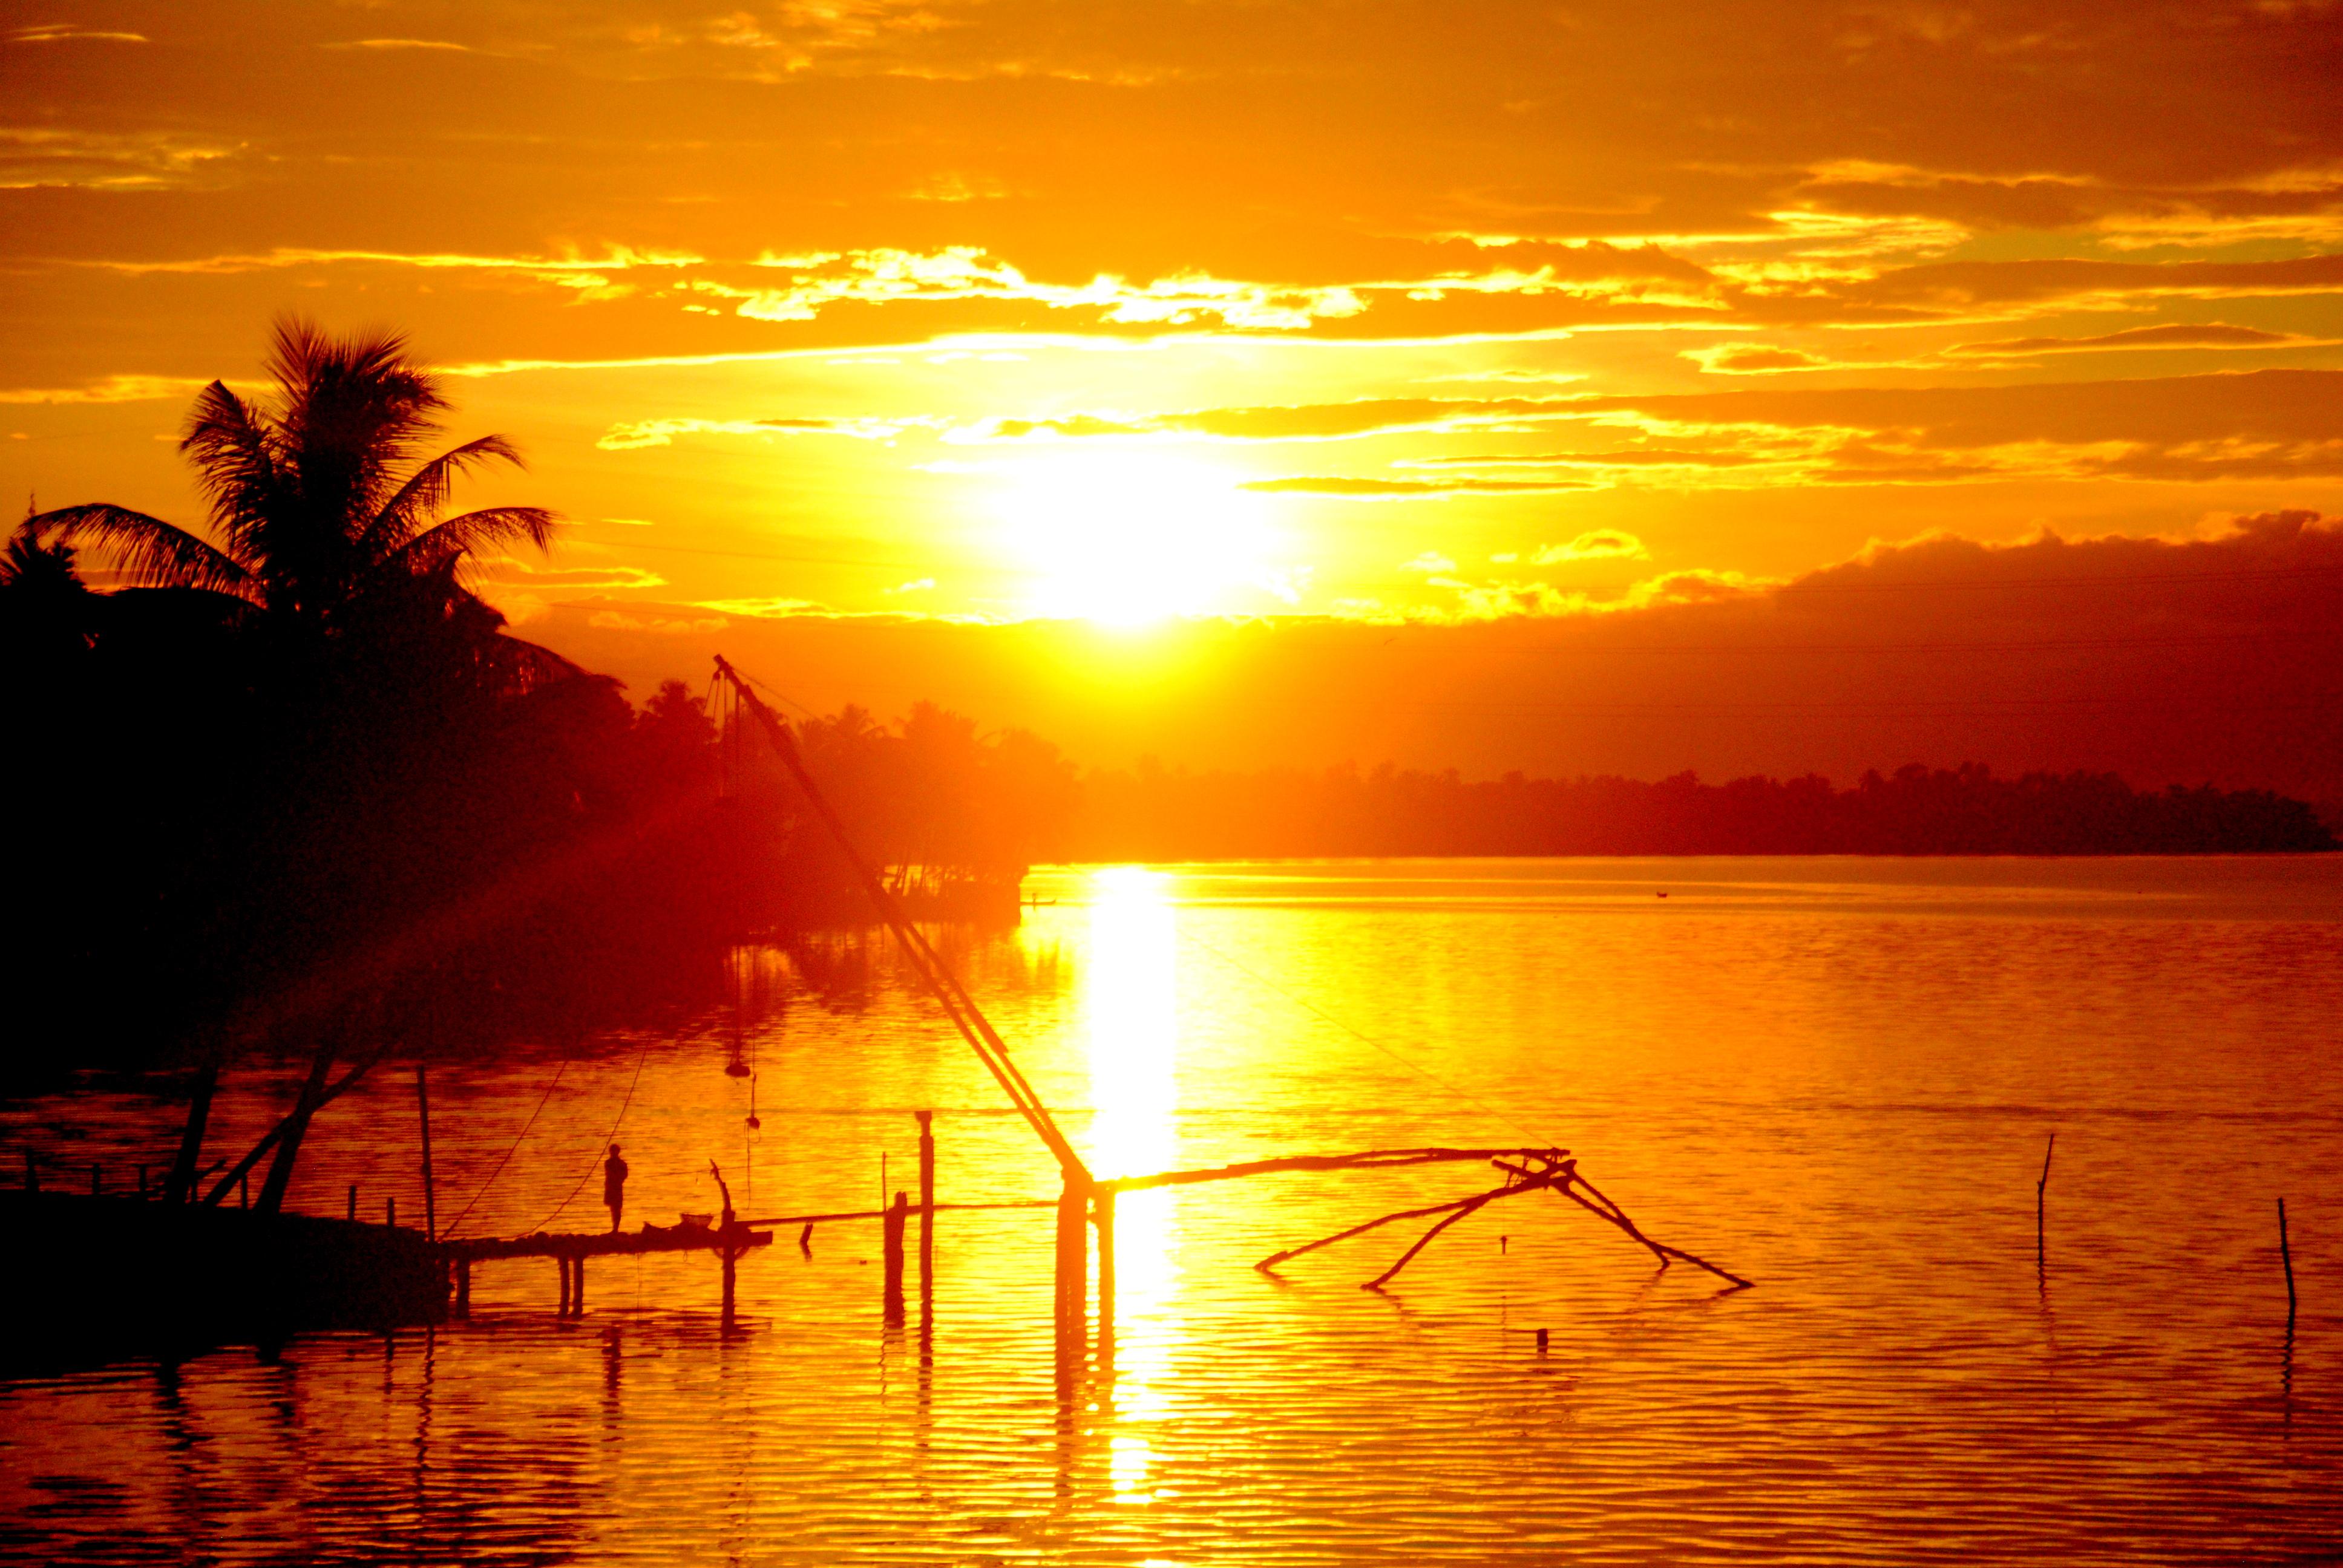 Drawn sunrise kerala scenery Mystical Sunsets Kerala Sunrise_Beauty_of_Nature Let's